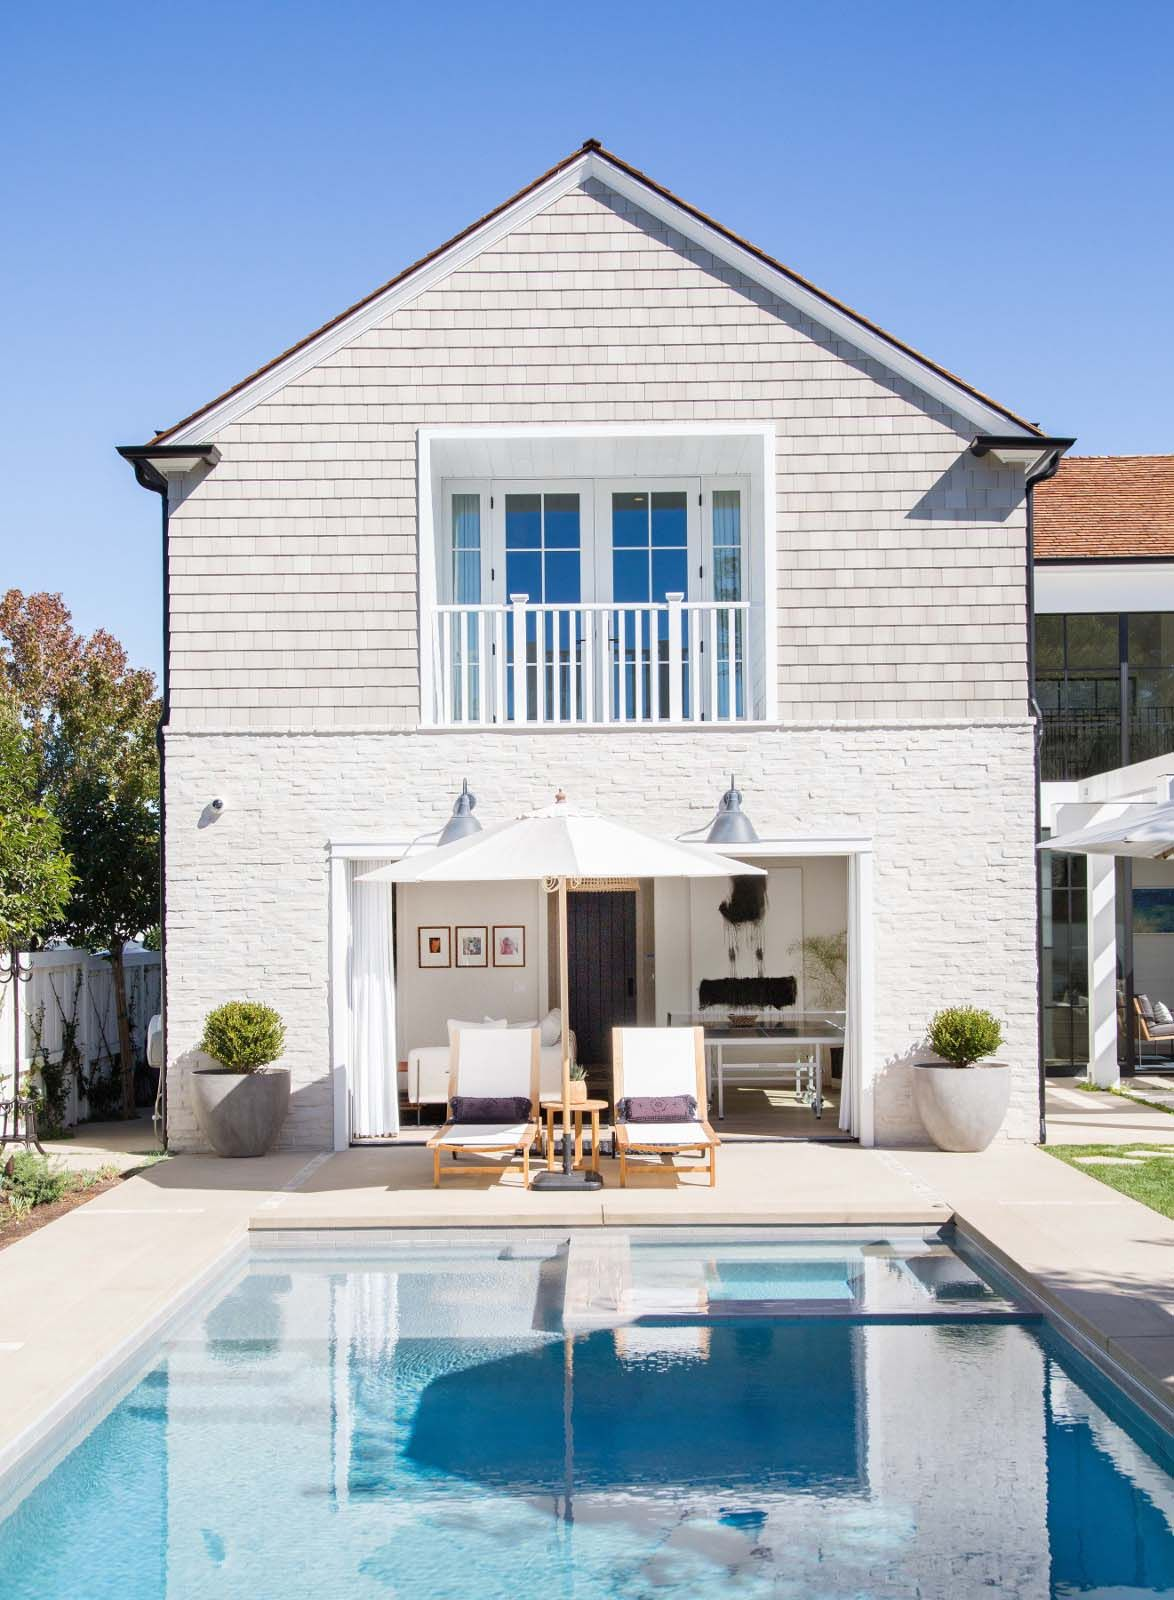 Luminous Coastal Chic Home Features Breezy Living In Newport Beach